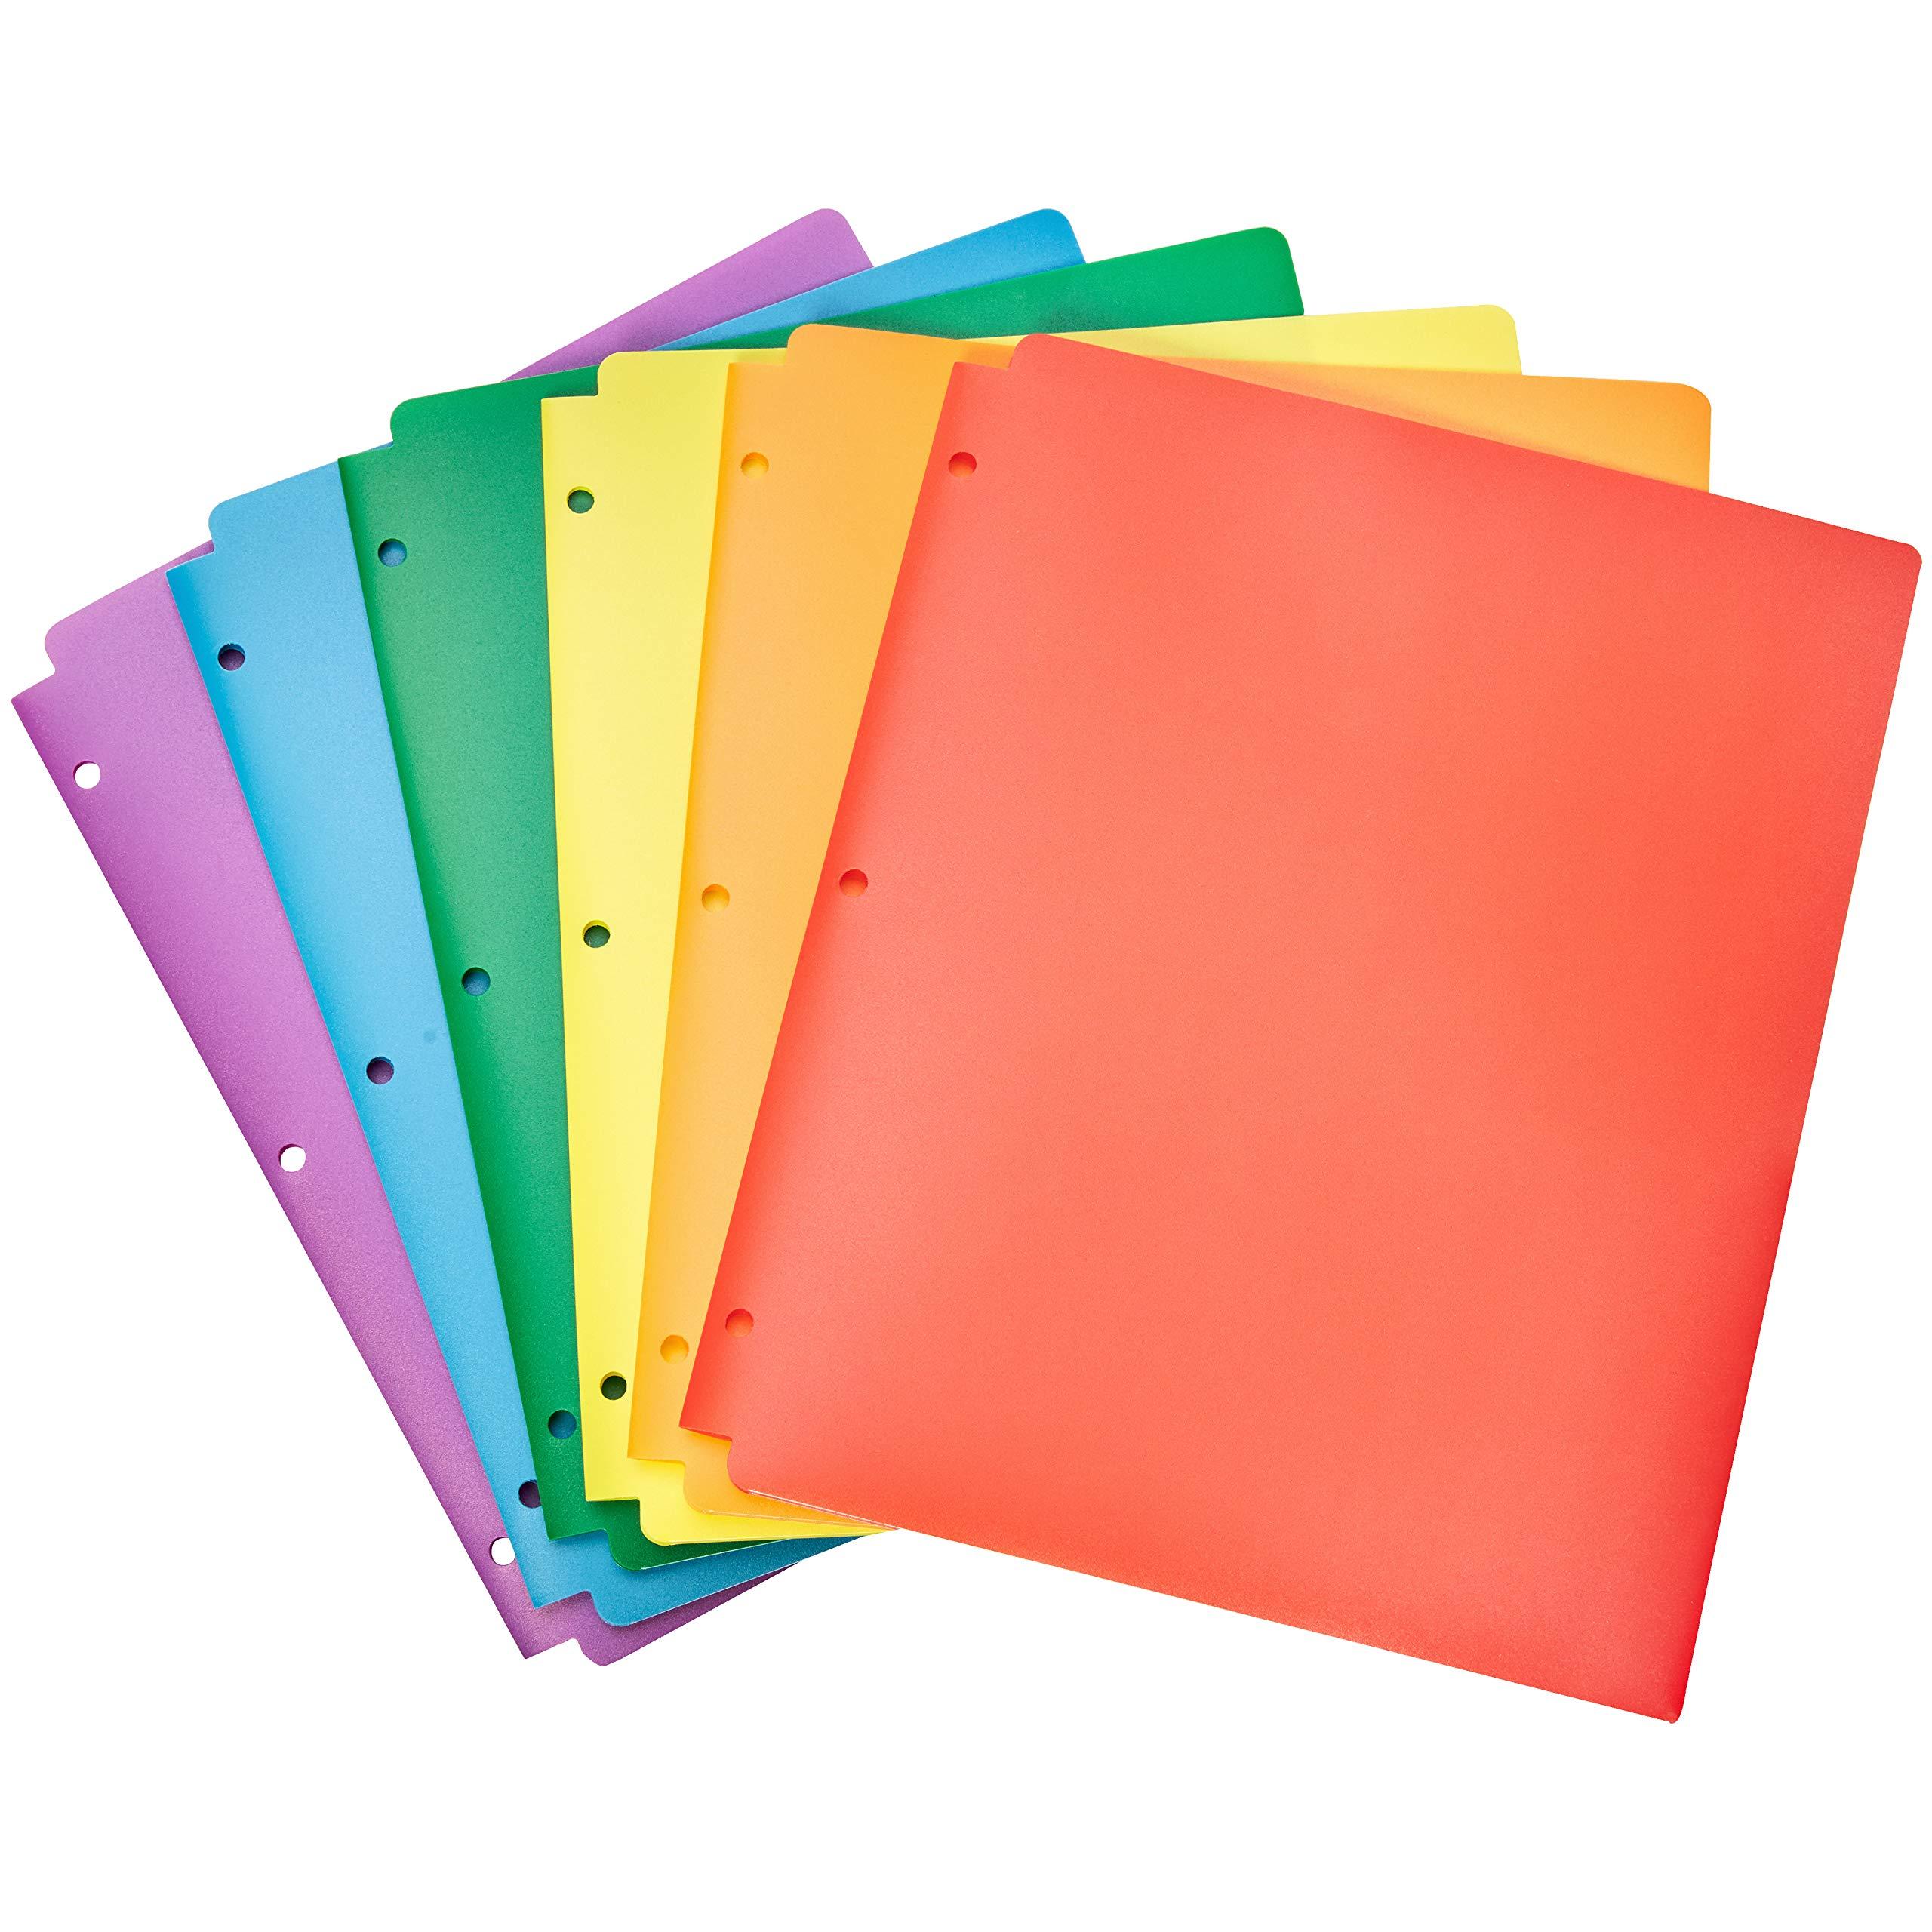 AmazonBasics Plastic 3 Hole Punch Folders with 2 Pockets, Multicolor Pack of 6 by AmazonBasics